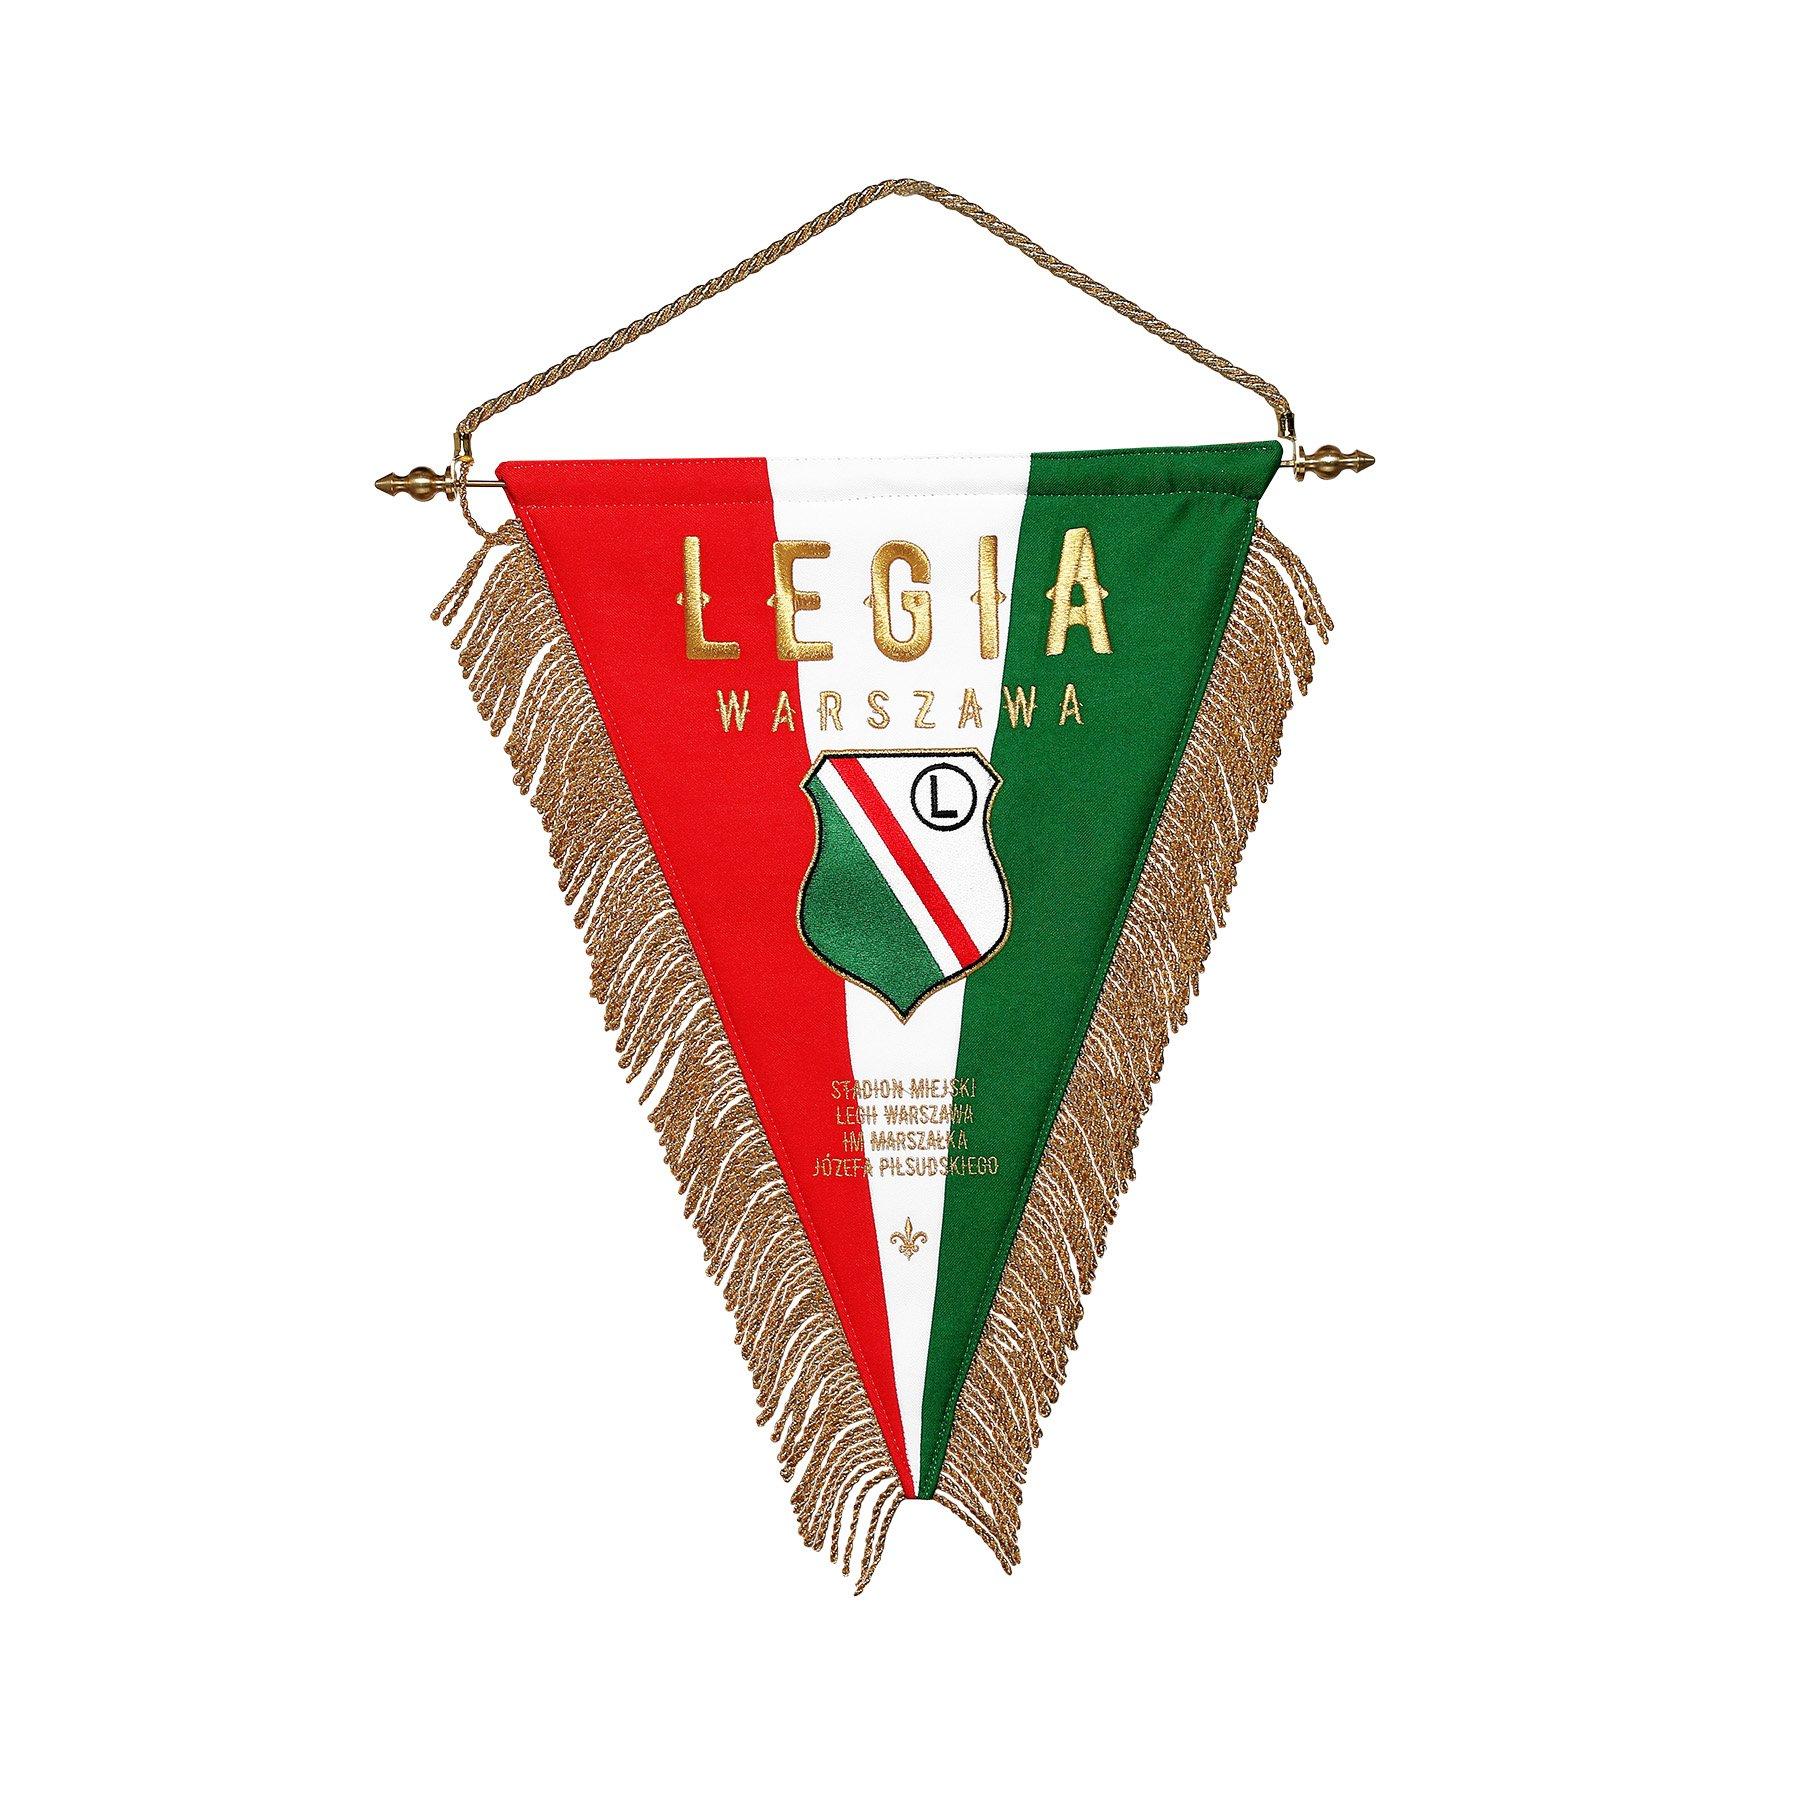 bd4c1b44f Akcesoria :: Meczowe :: Flagi i proporce :: Proporzec 2018